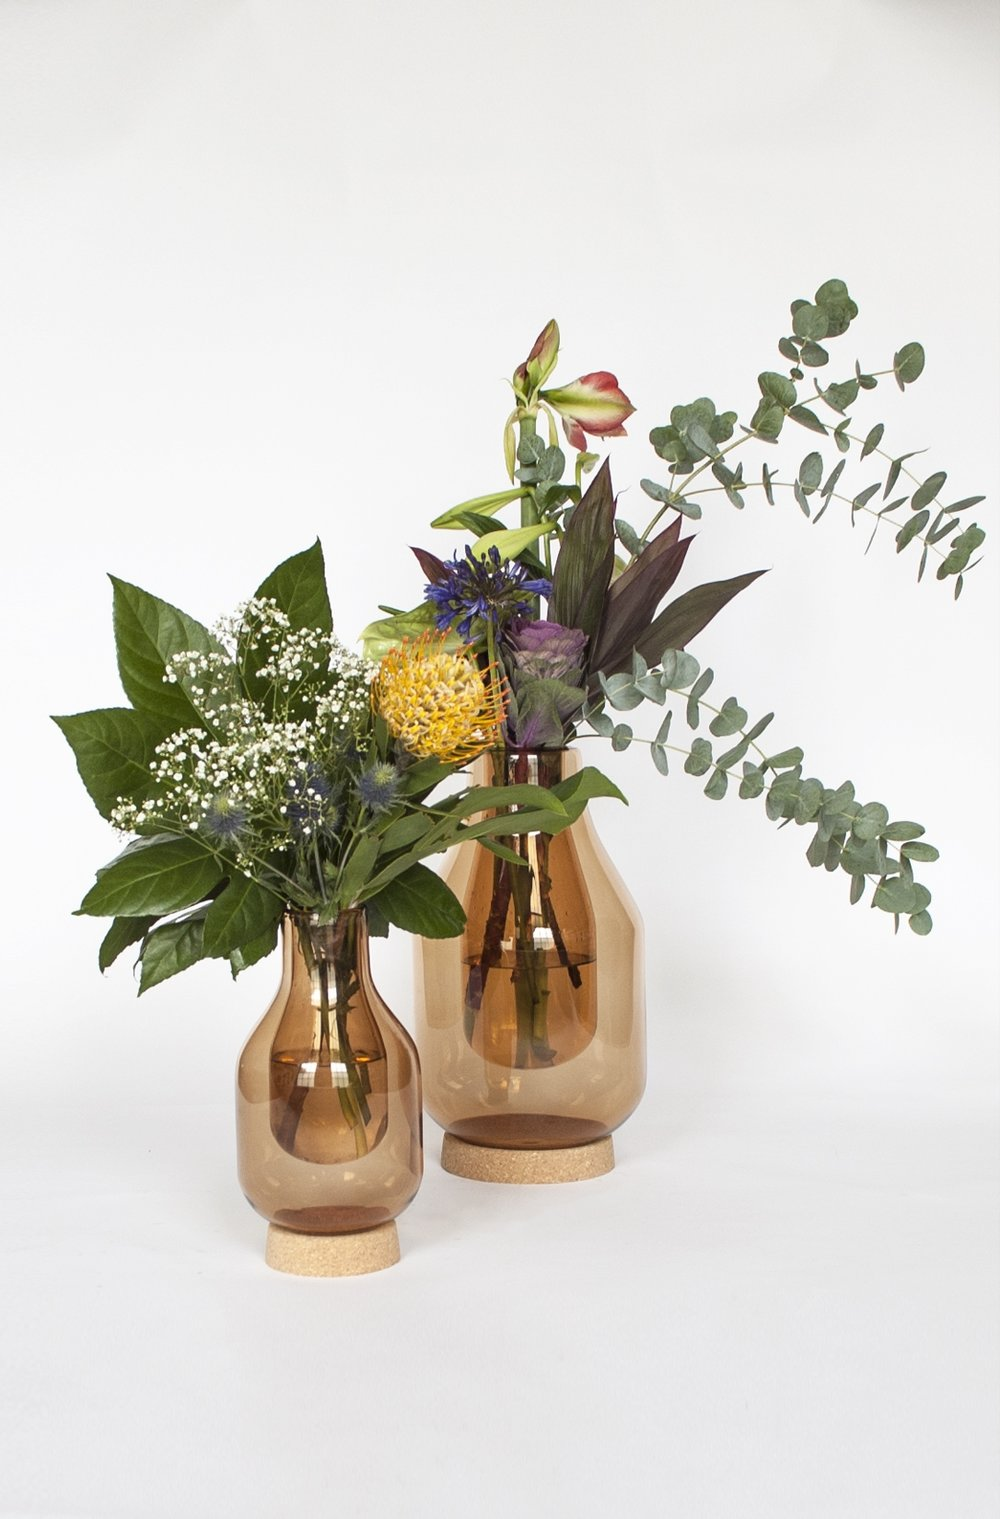 Dewar Vase small and large 1 - David Derksen Design.jpg